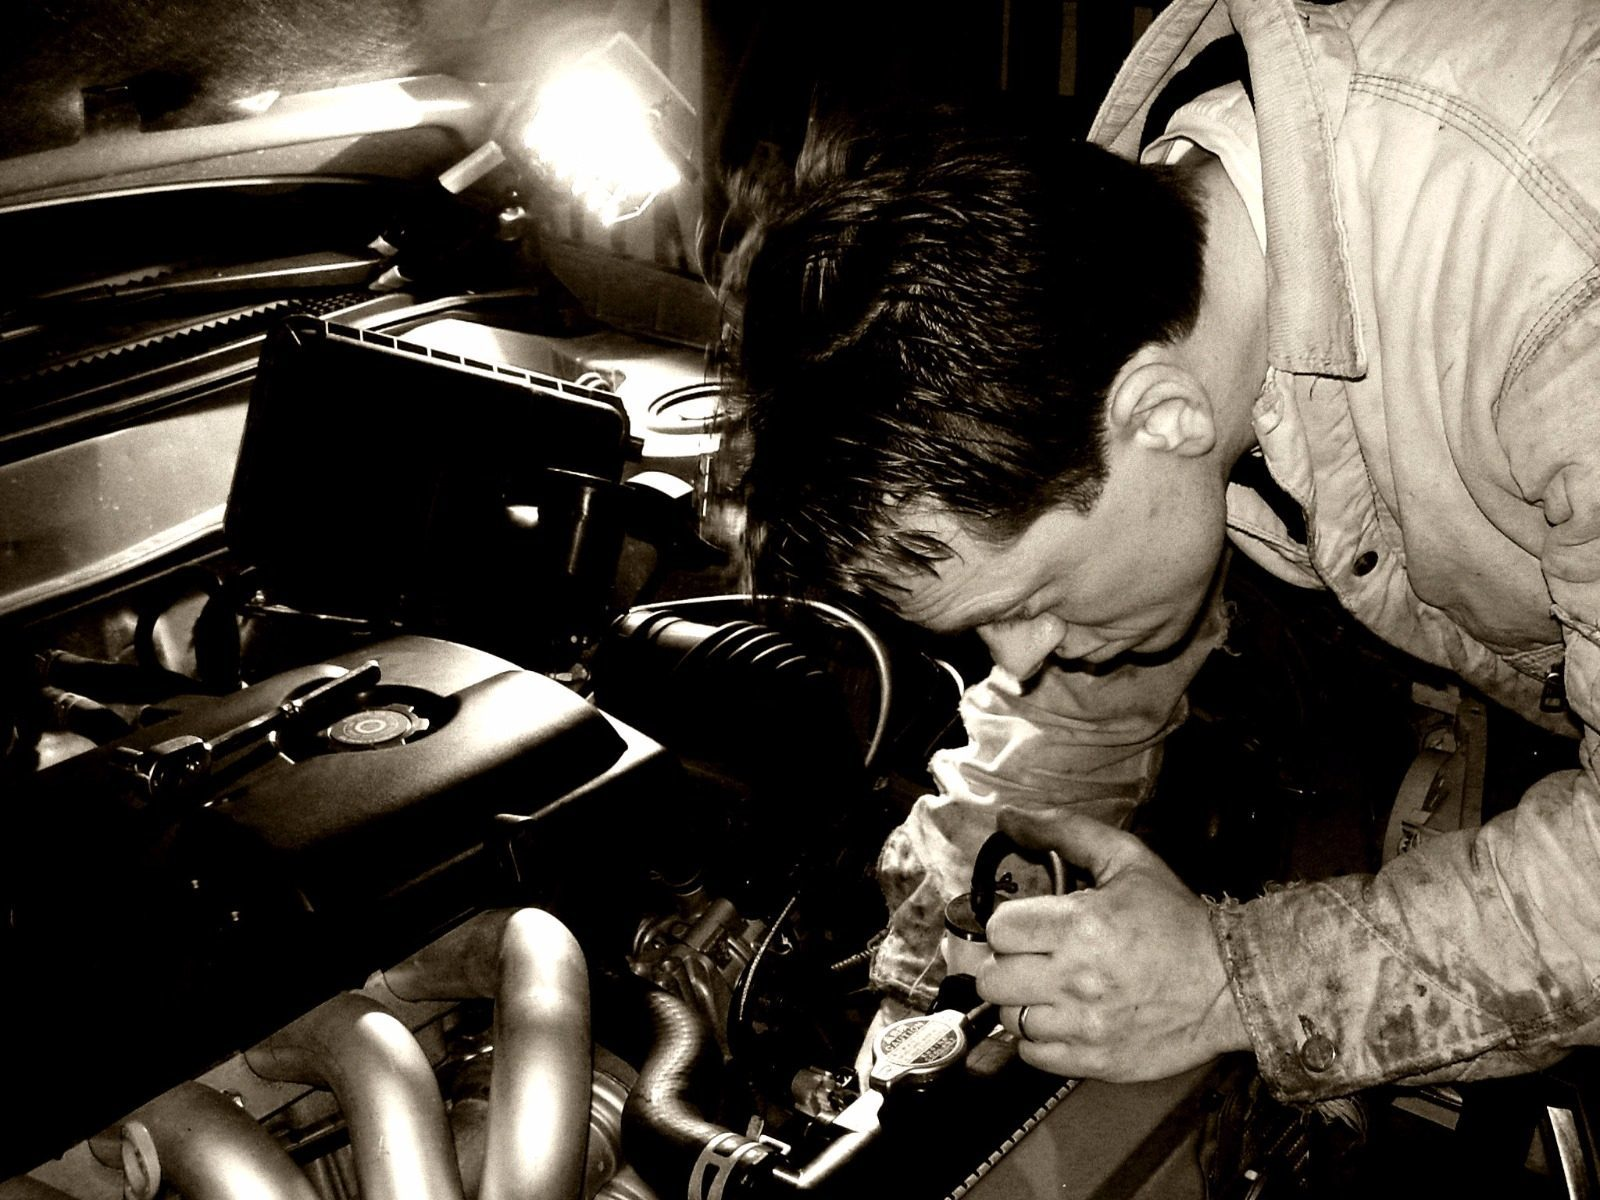 Mechanic working on auto engine